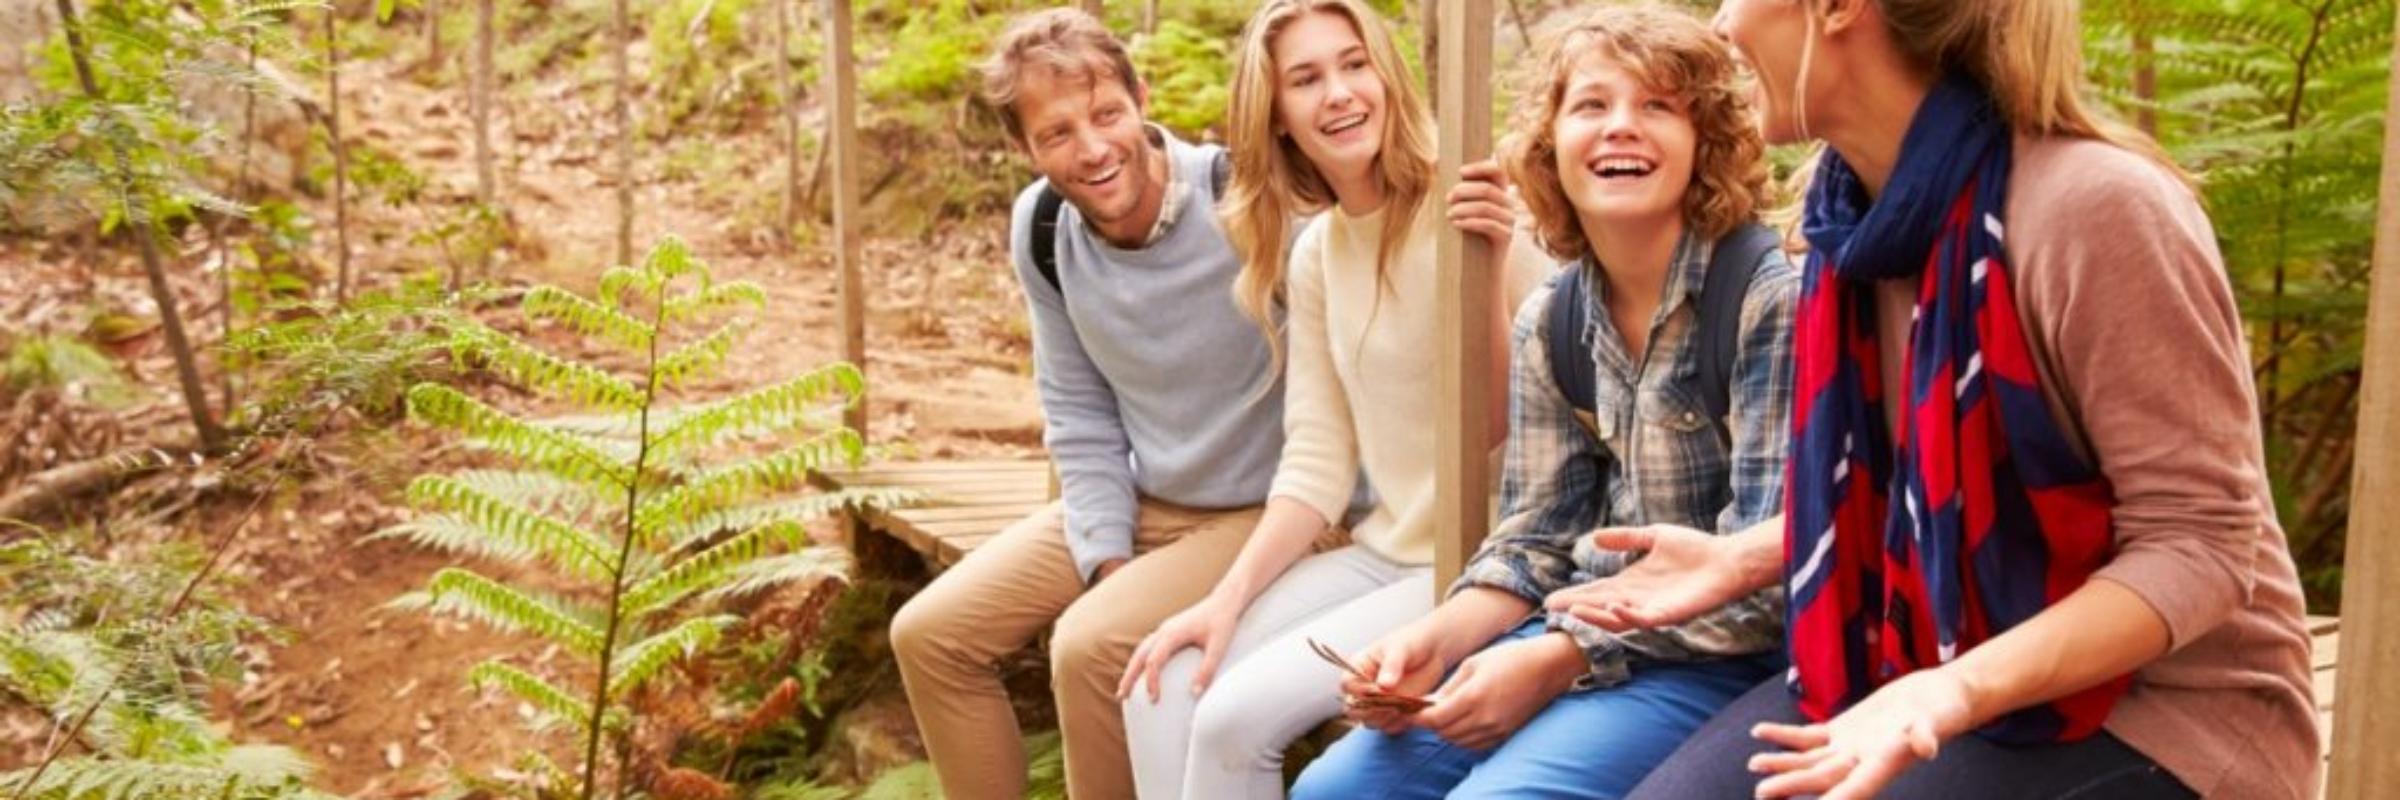 motts_sliderFamily sitting in woods during fall